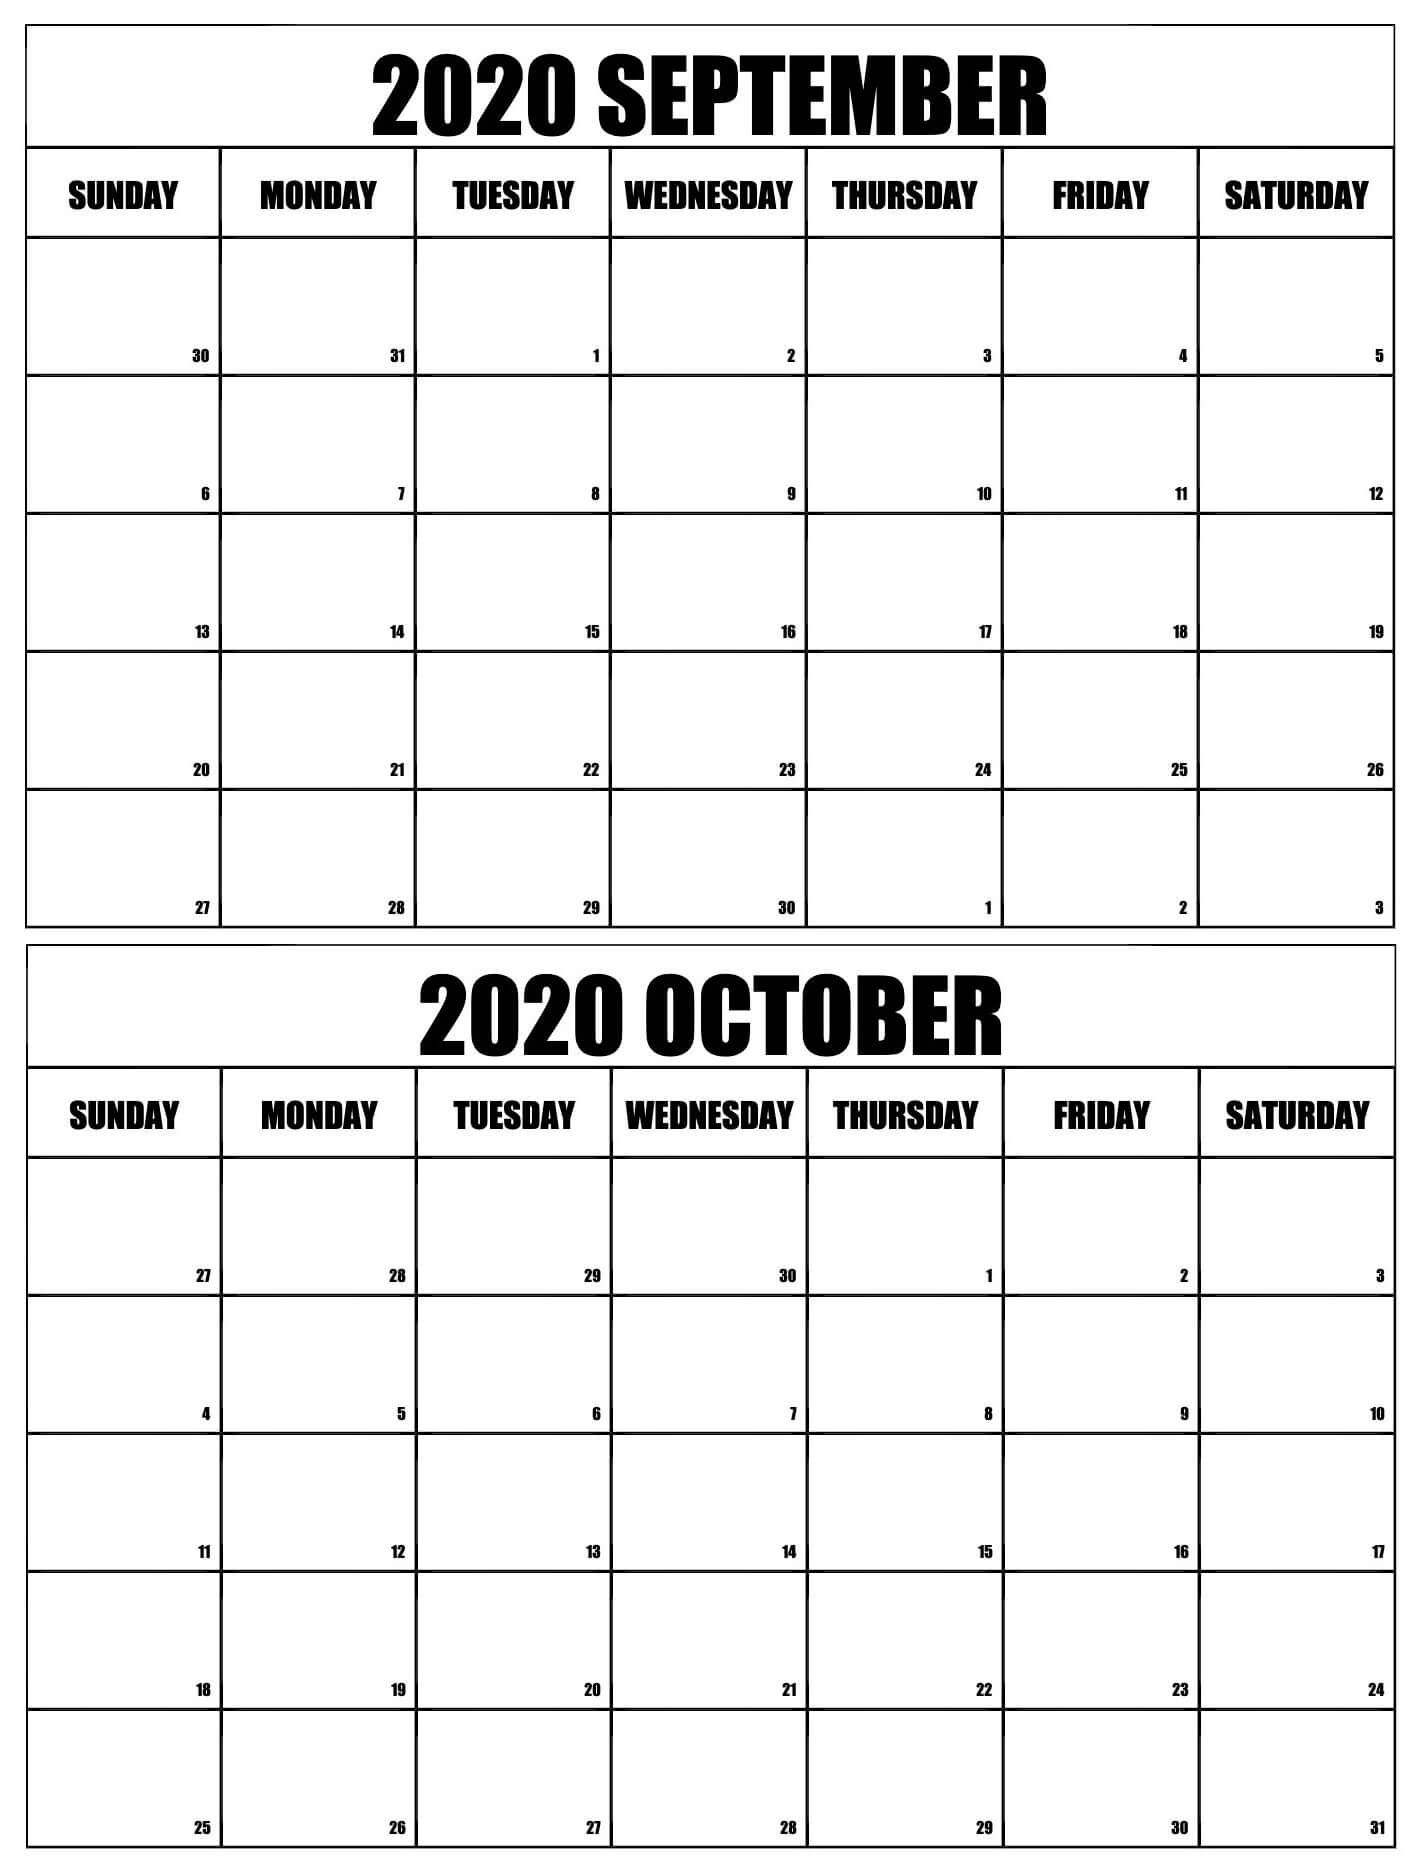 Free September 2020 To February 2021 Calendar Word With Notes - One Platform For Digital October 2020 - September 2021 Calendar